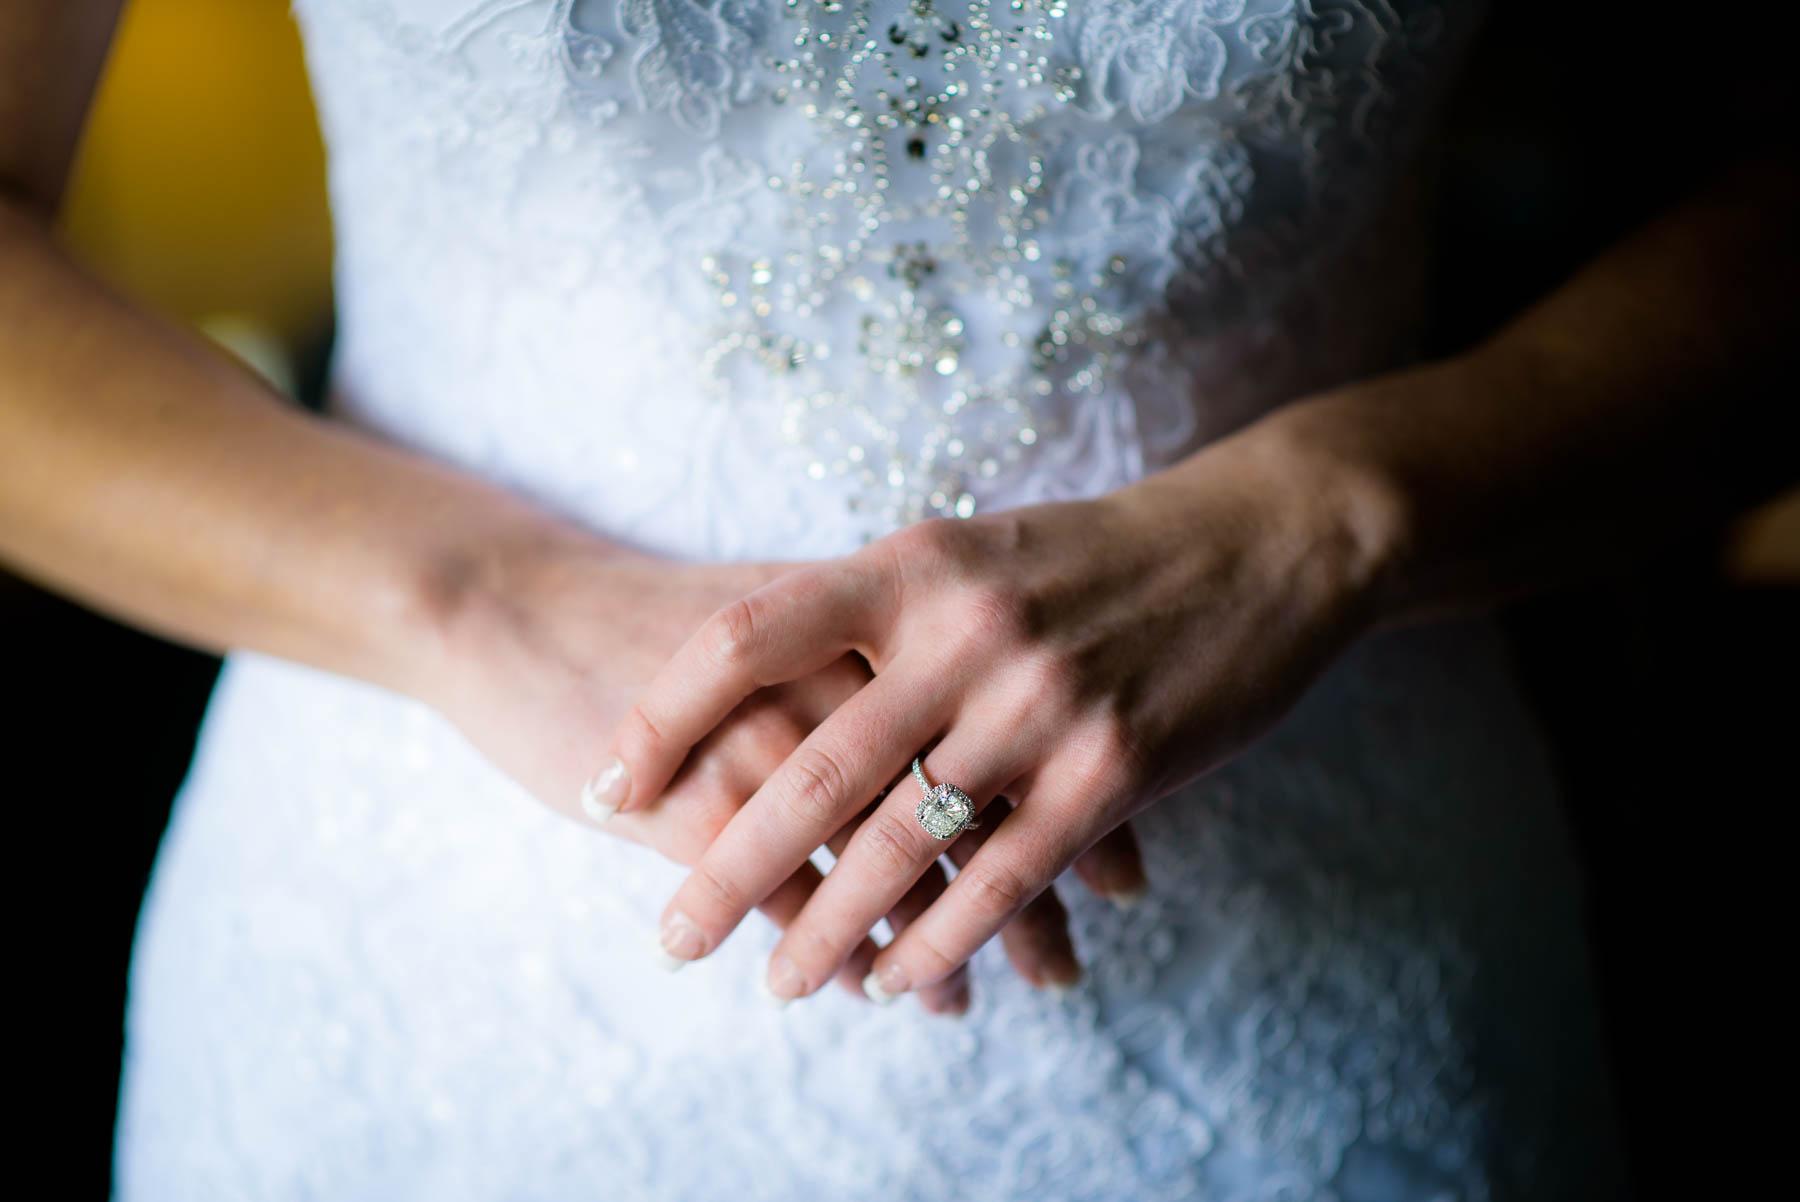 Close up wedding ring and wedding dress detail photo.